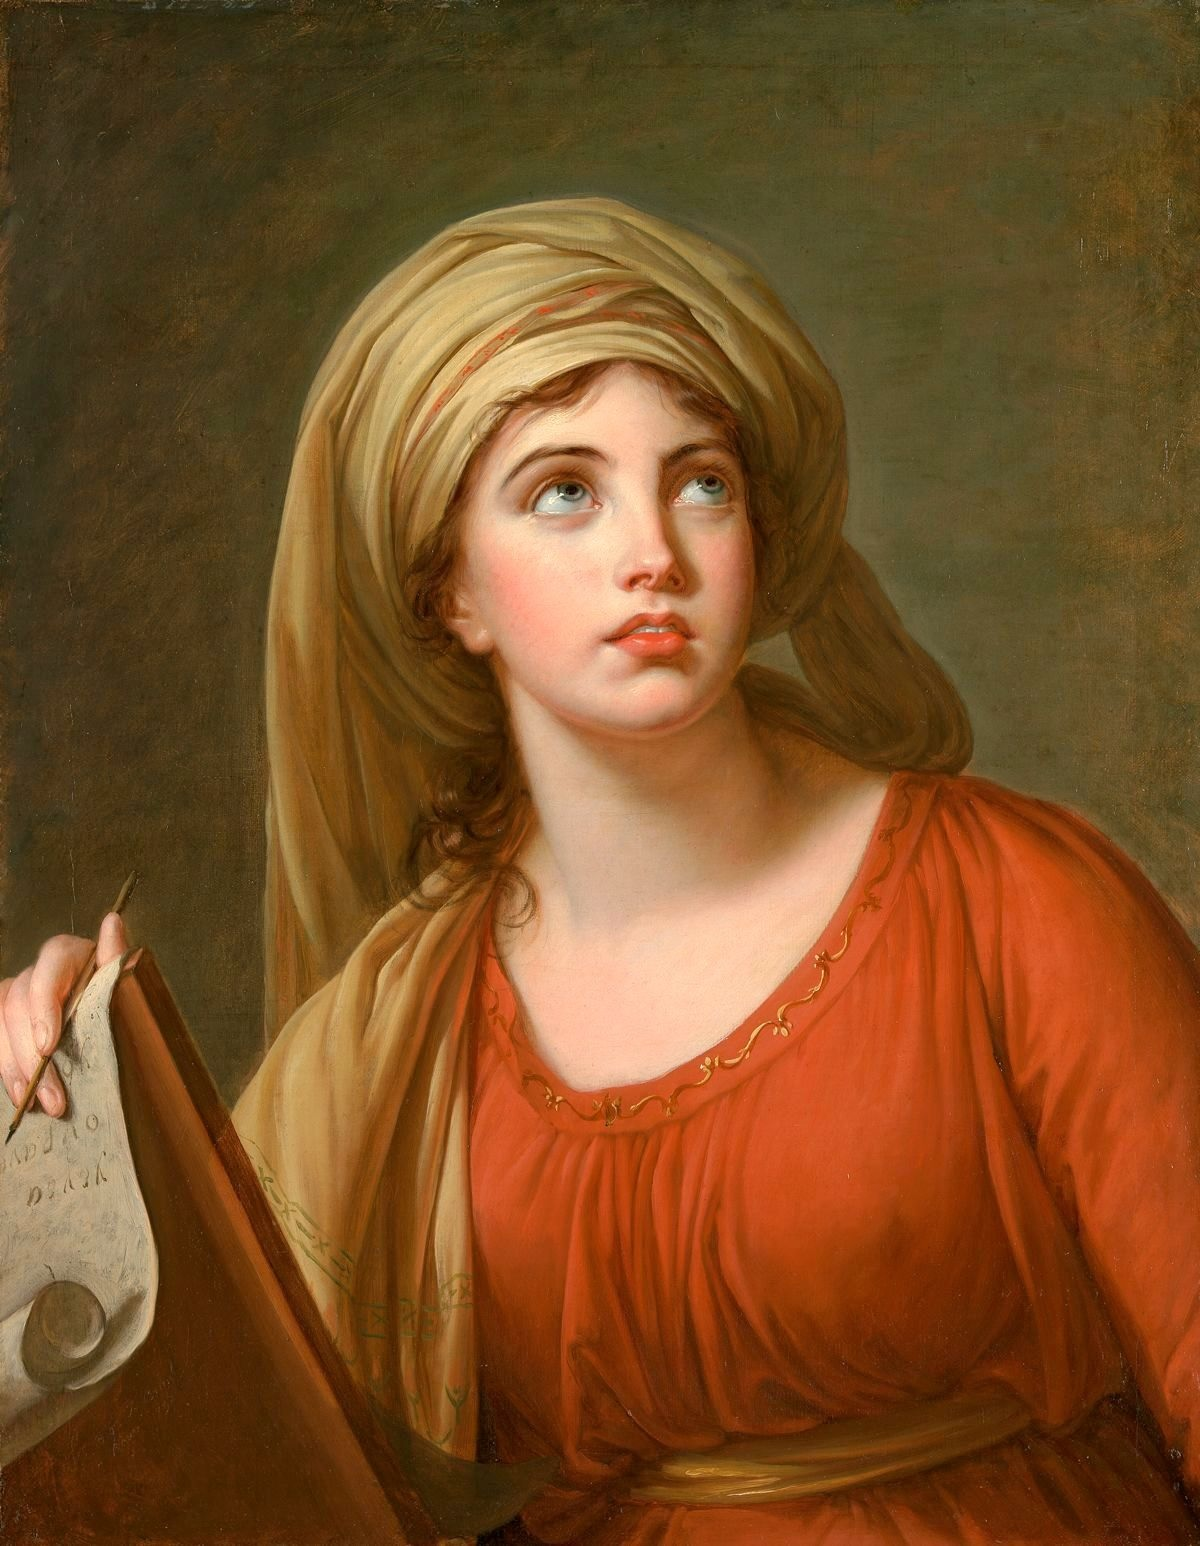 File:Elisabeth Vigée-Lebrun - Lady Hamilton as the Persian Sibyl.jpg